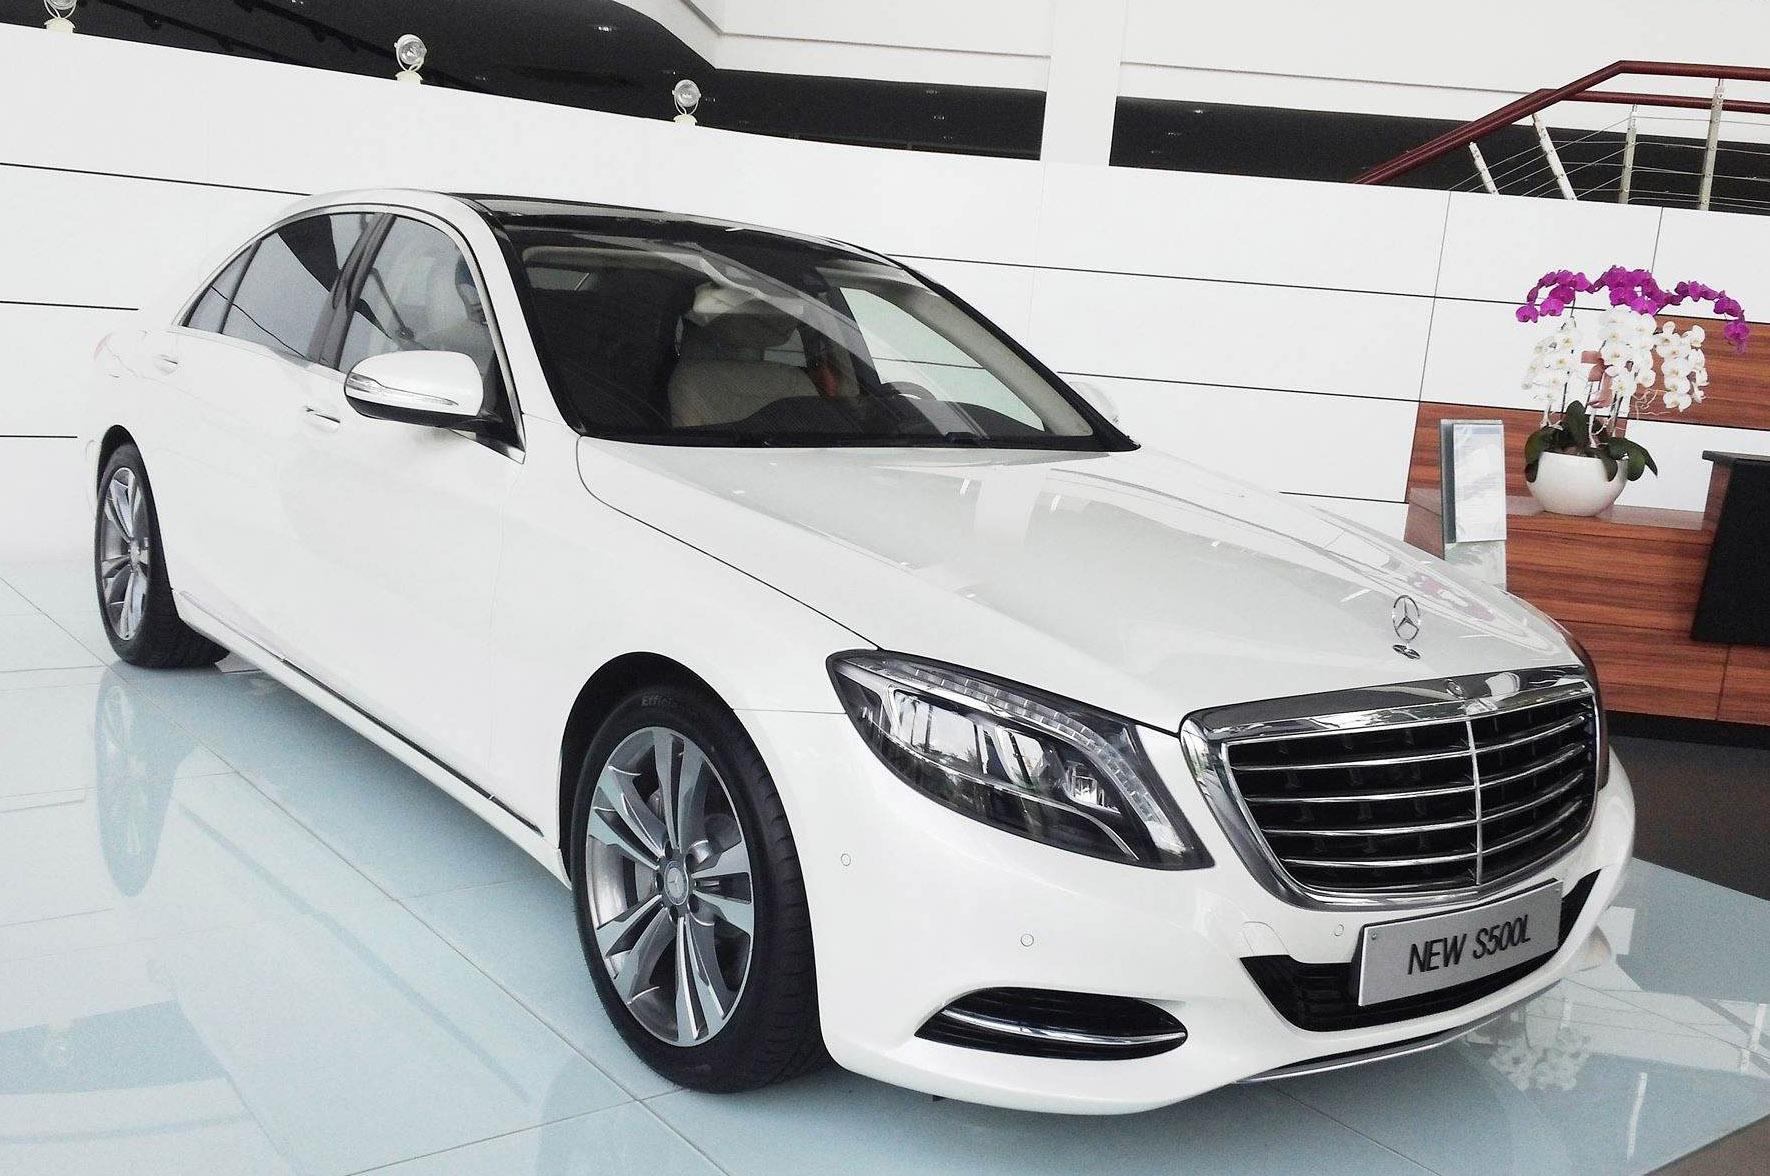 Th vi t ph ph p mercedes benz s500l th nh s65 amg for Mercedes benz 663